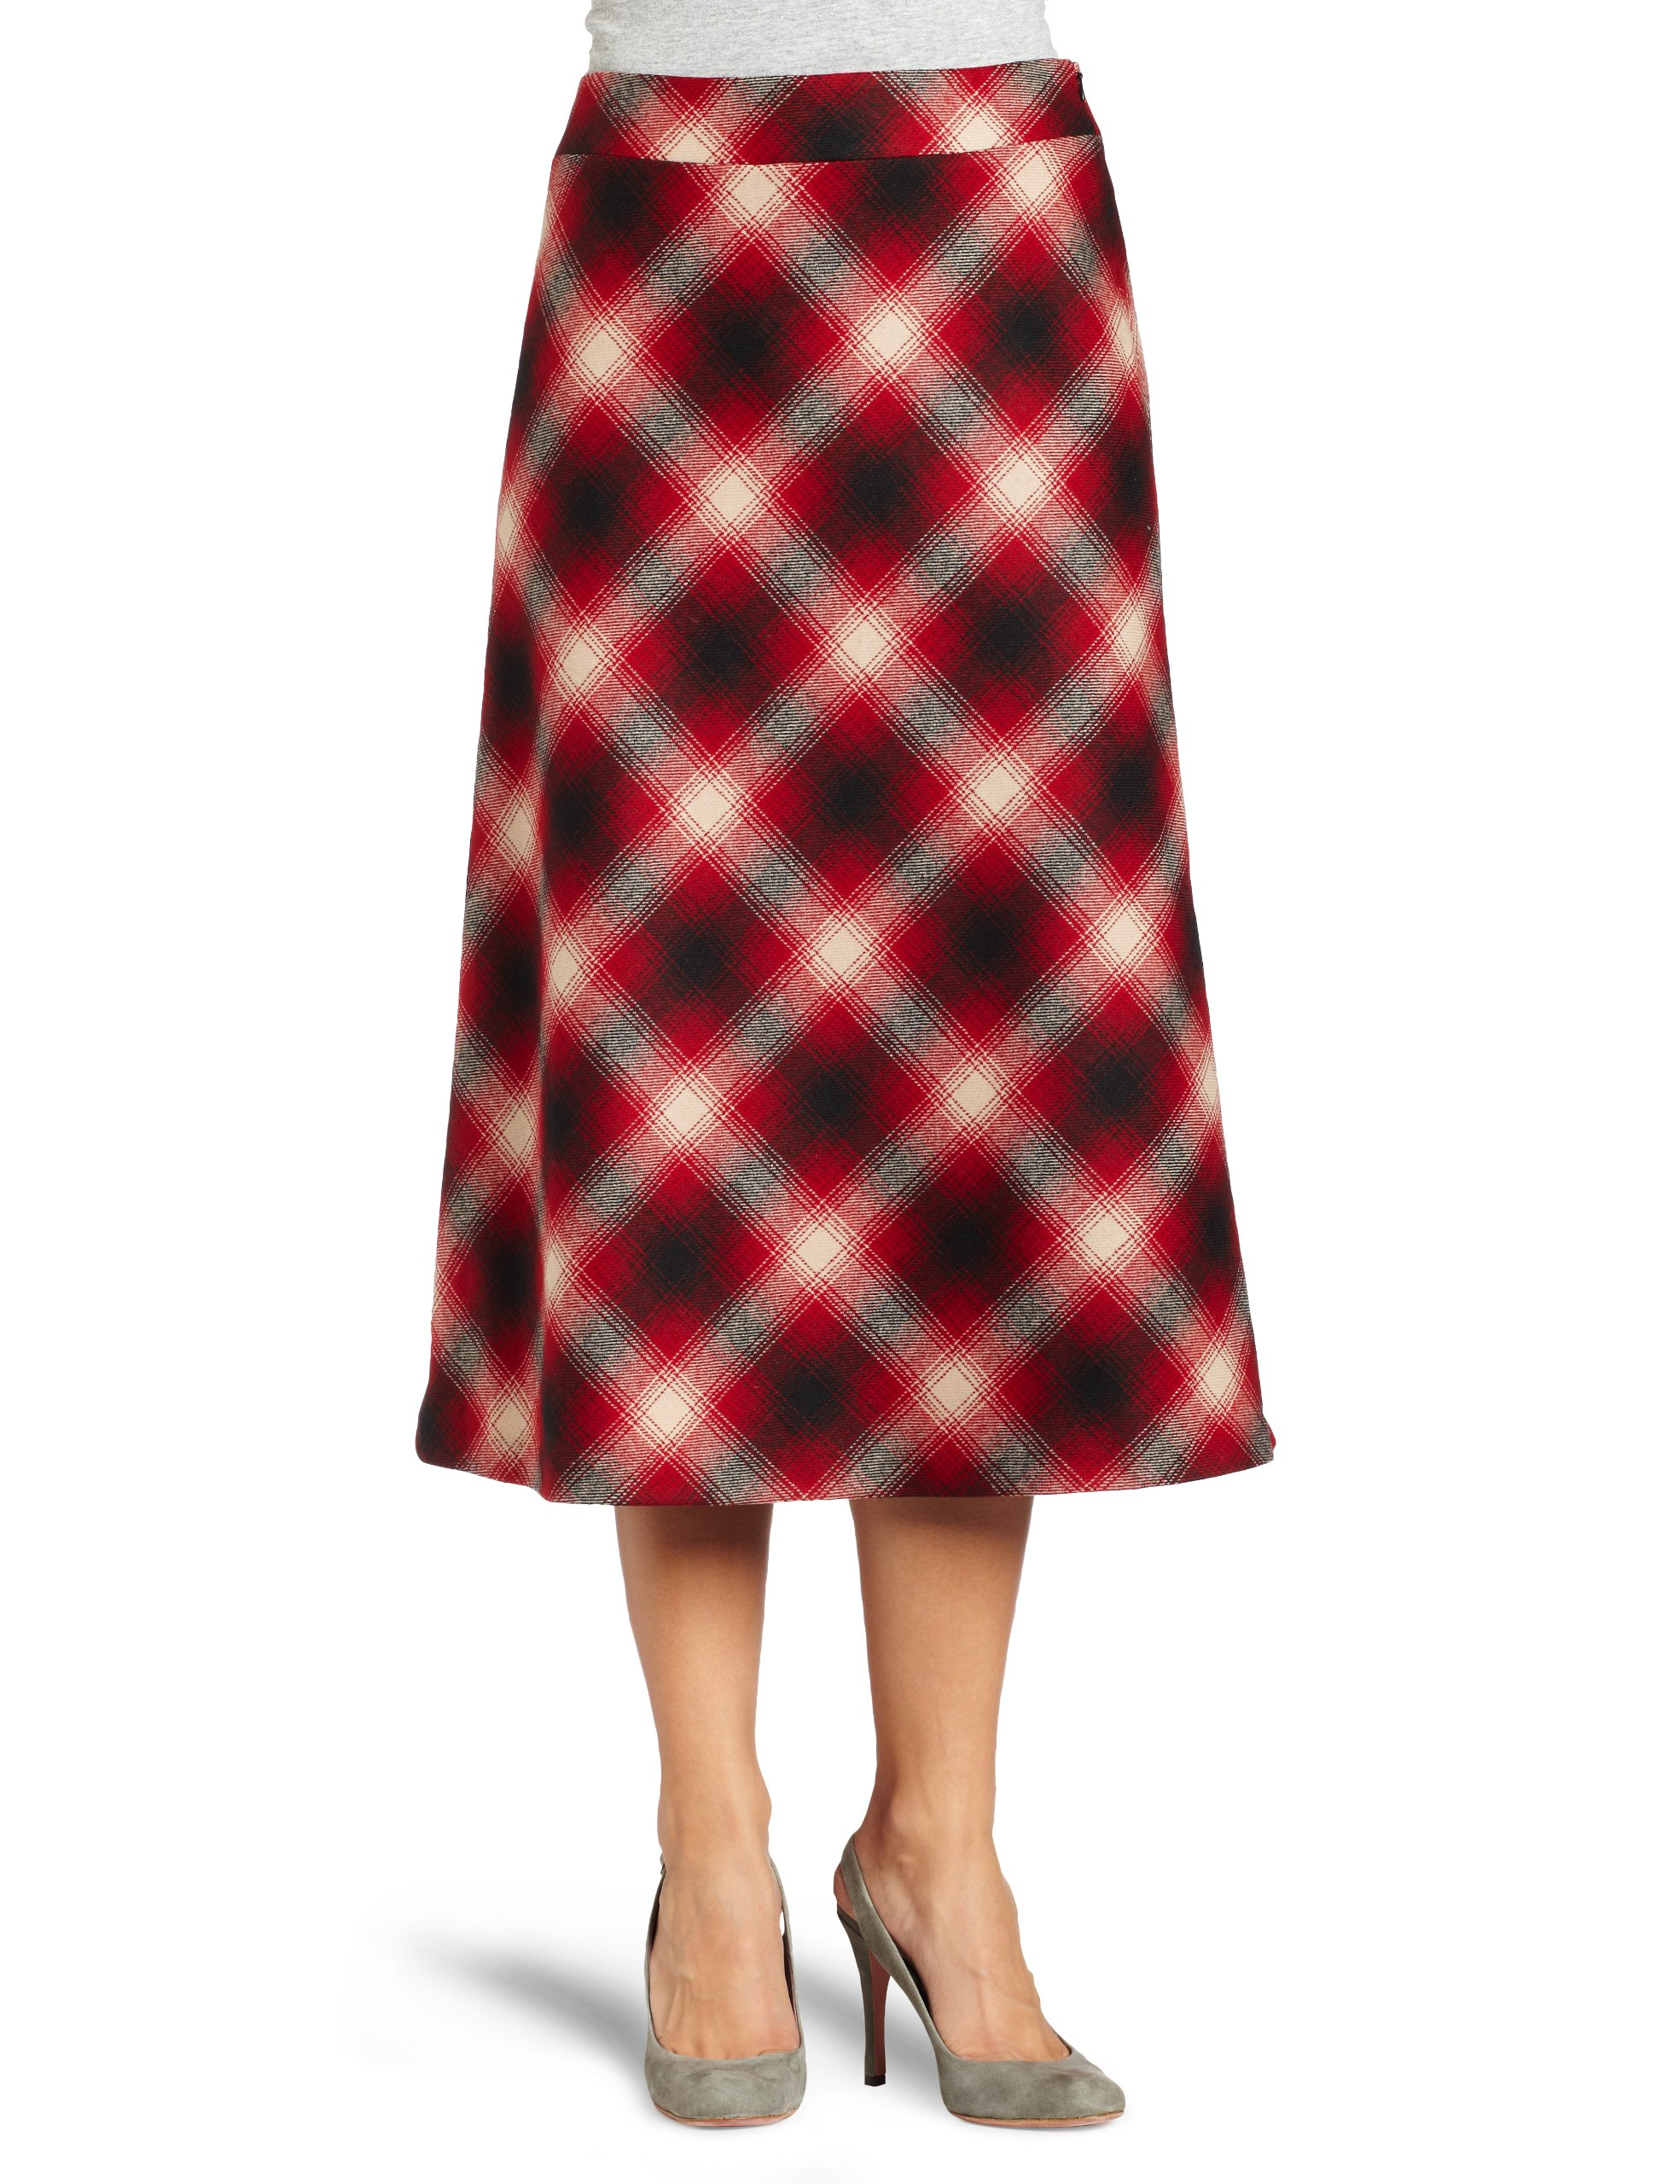 Pendleton Women's Bias Plaid Skirt, Black/Red Ombre Plaid, 18